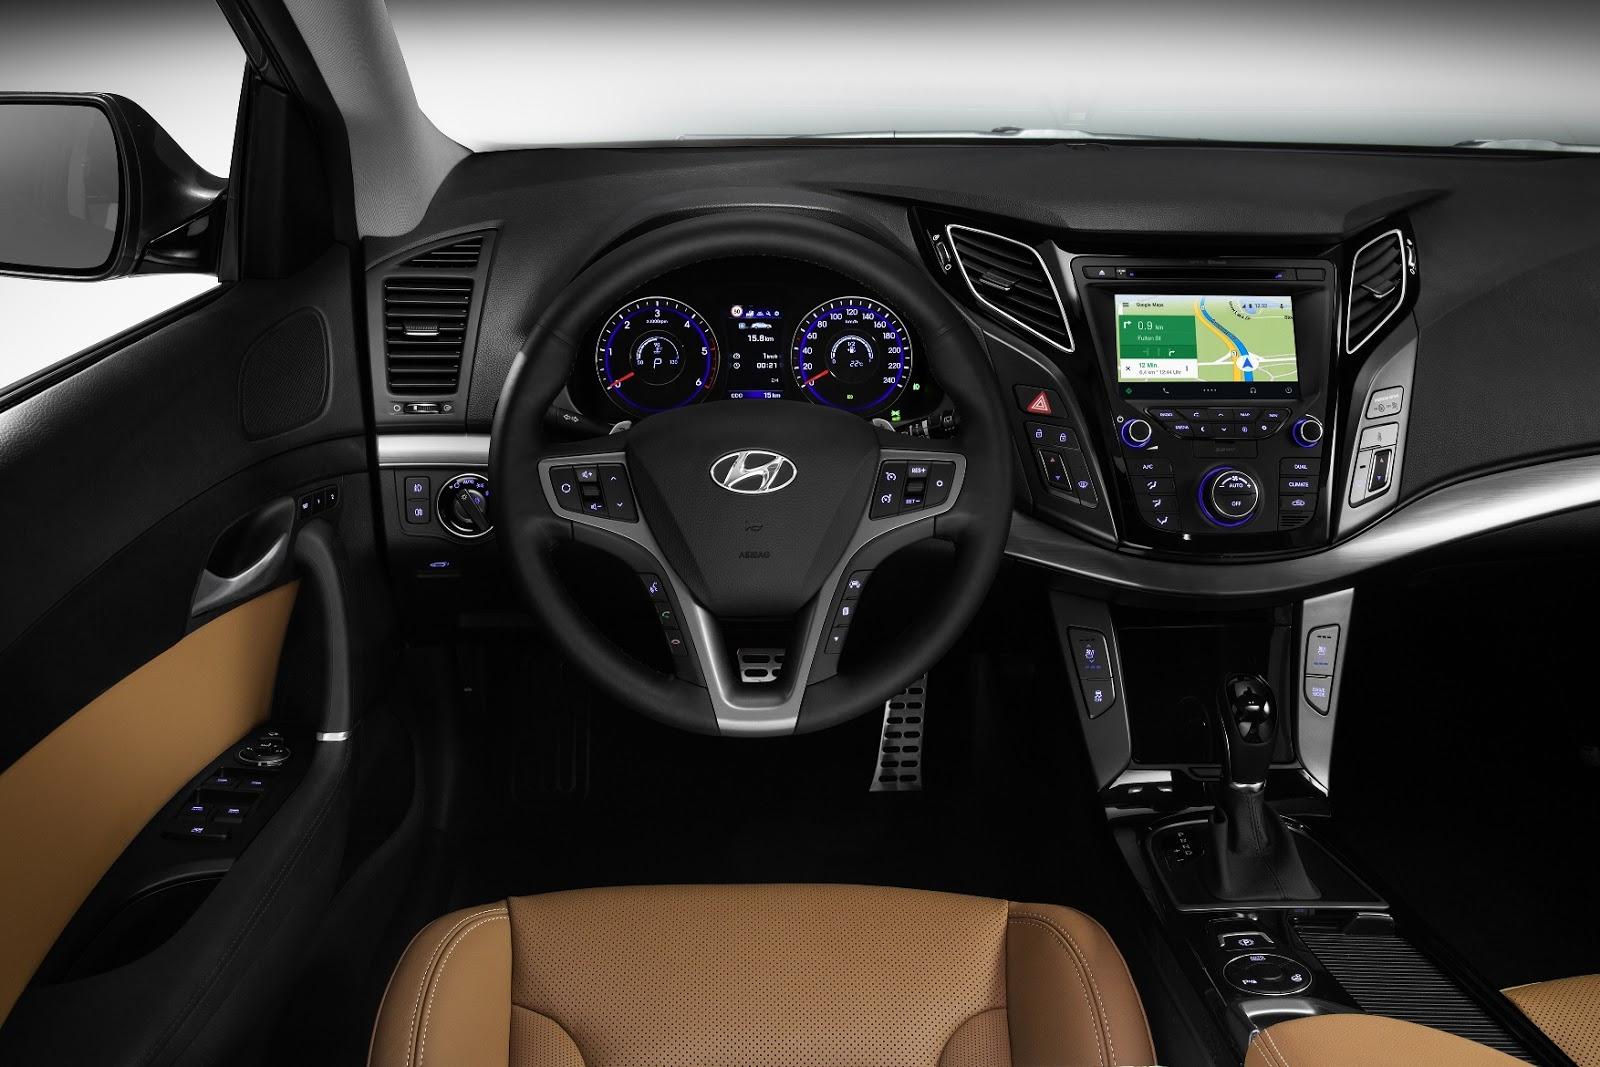 Hyundai%2Bi40%2BAndroid%2BAuto Η Hyundai αντεπιτίθεται στη Φρανκφούρτη! Android Auto, autoshow, Frankfurt Motor Show, Hyundai, Hyundai i20, Hyundai Motor, Hyundai Santa Fe